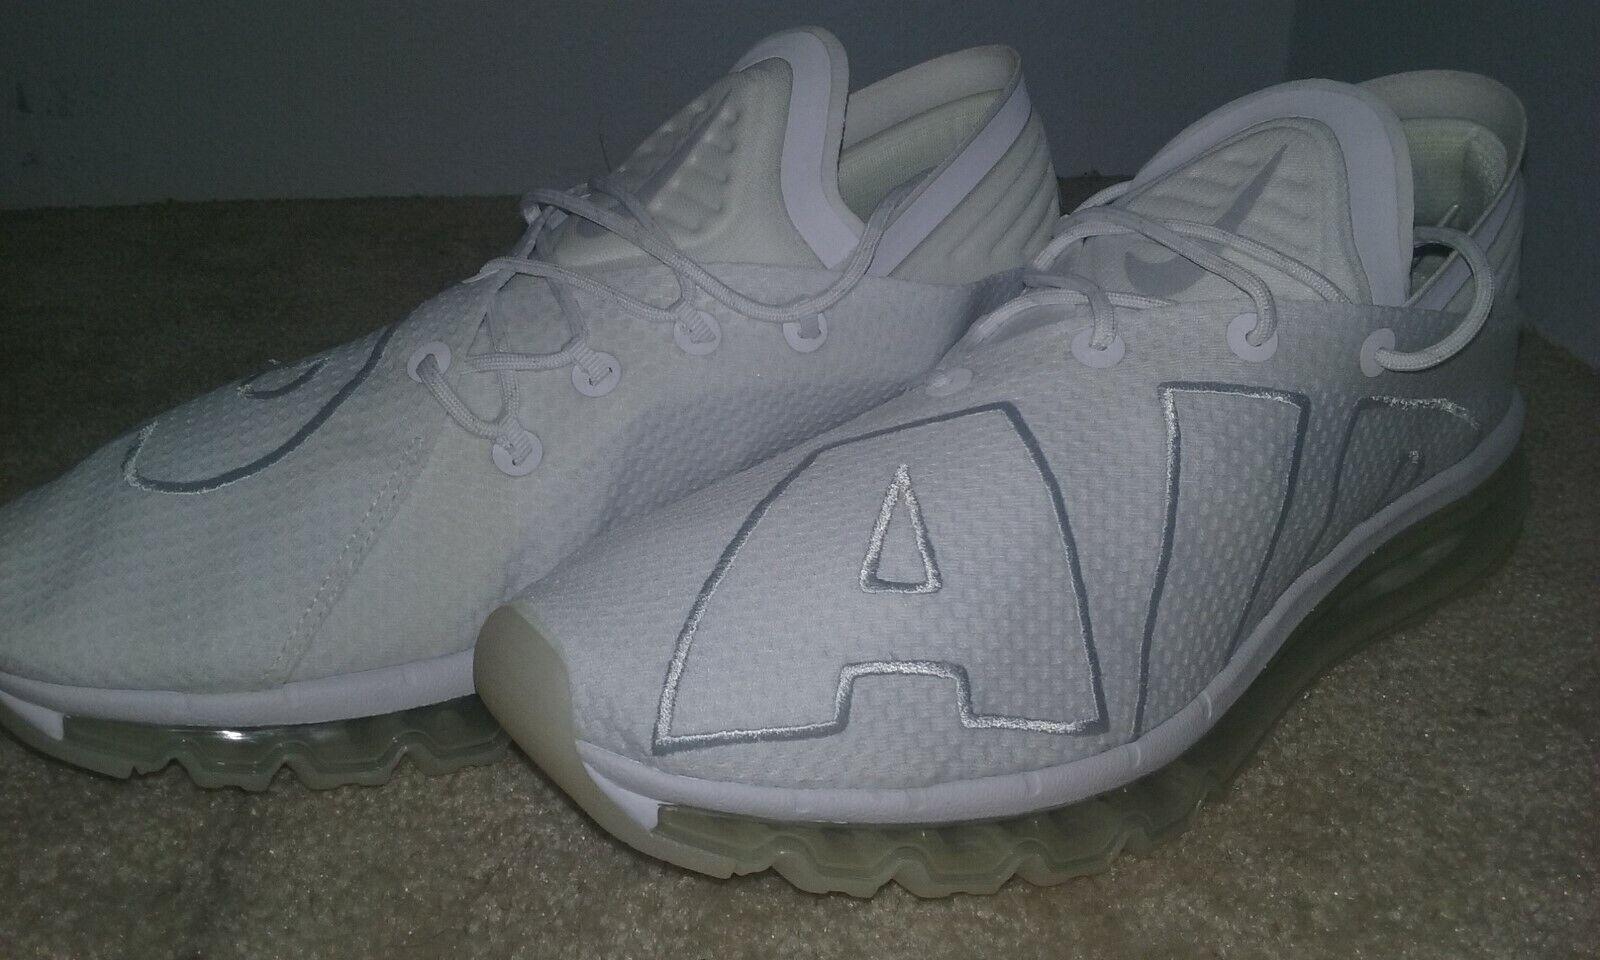 Nike Air Max Flair Running shoes Men's White\Pure Platimum size 13